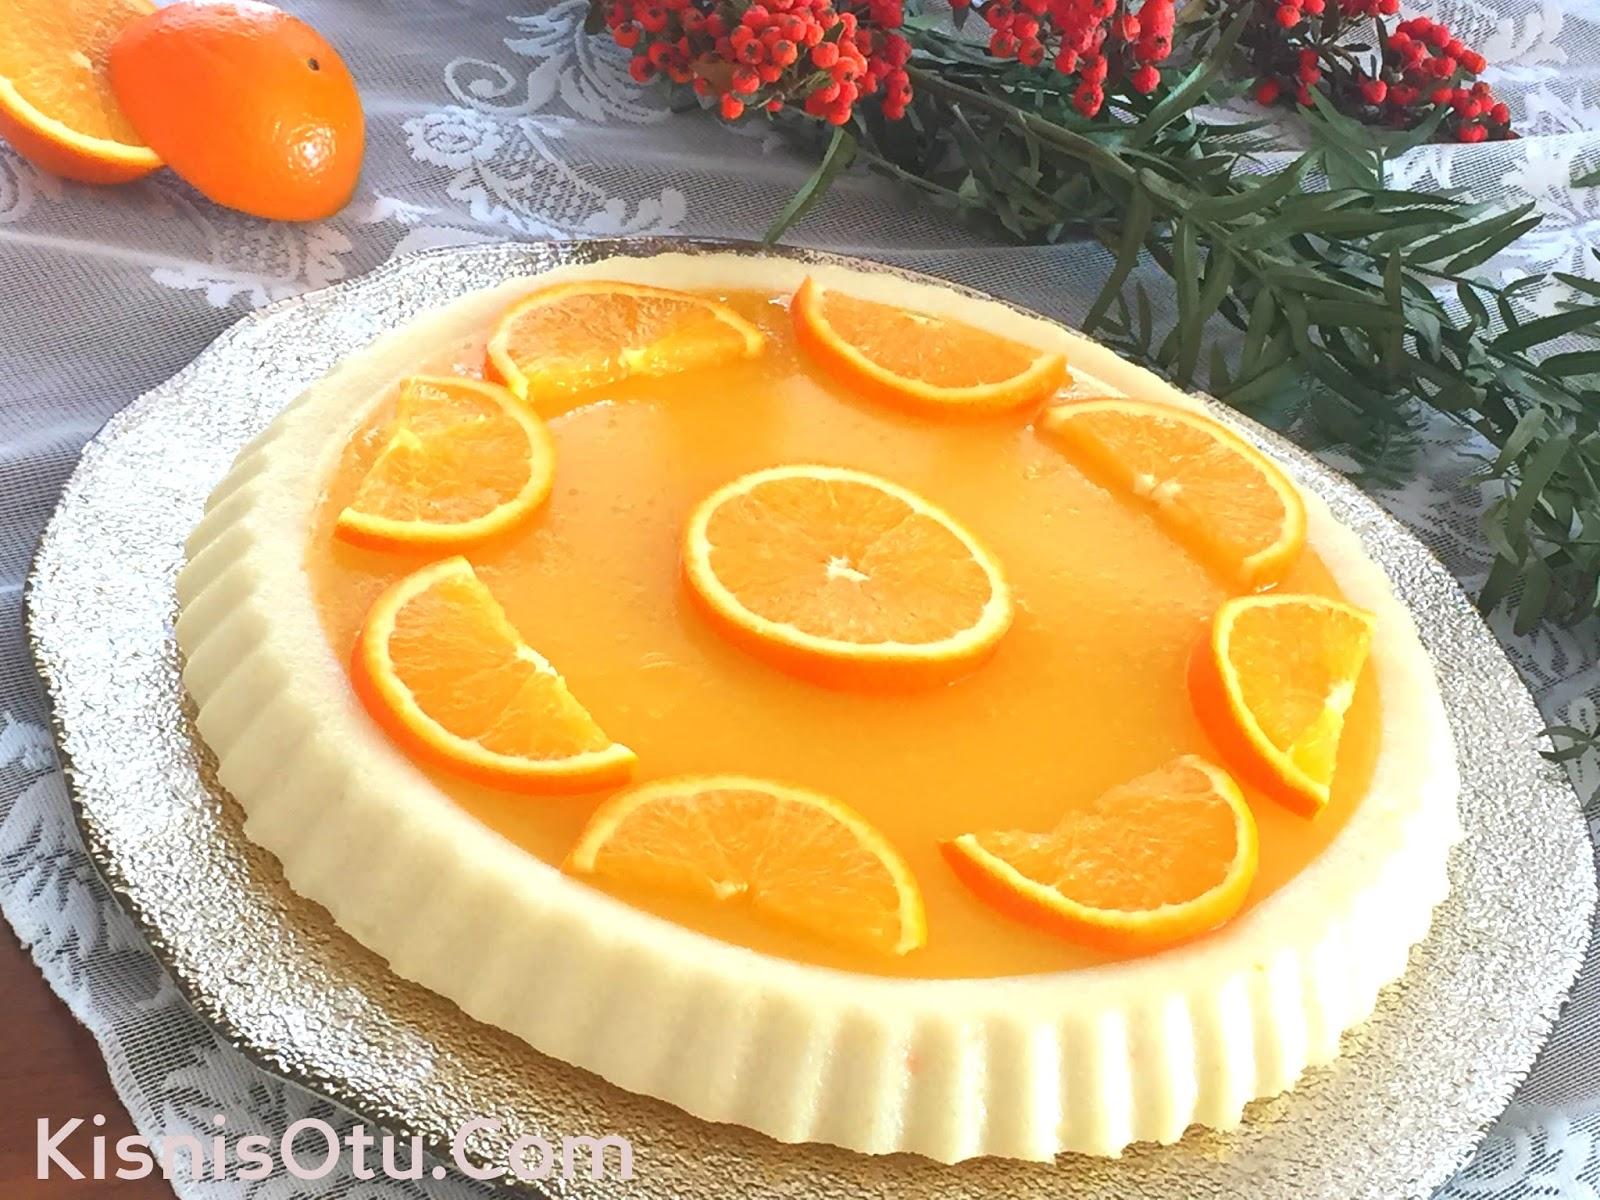 Portakal Pelteli Irmik Tatlısı